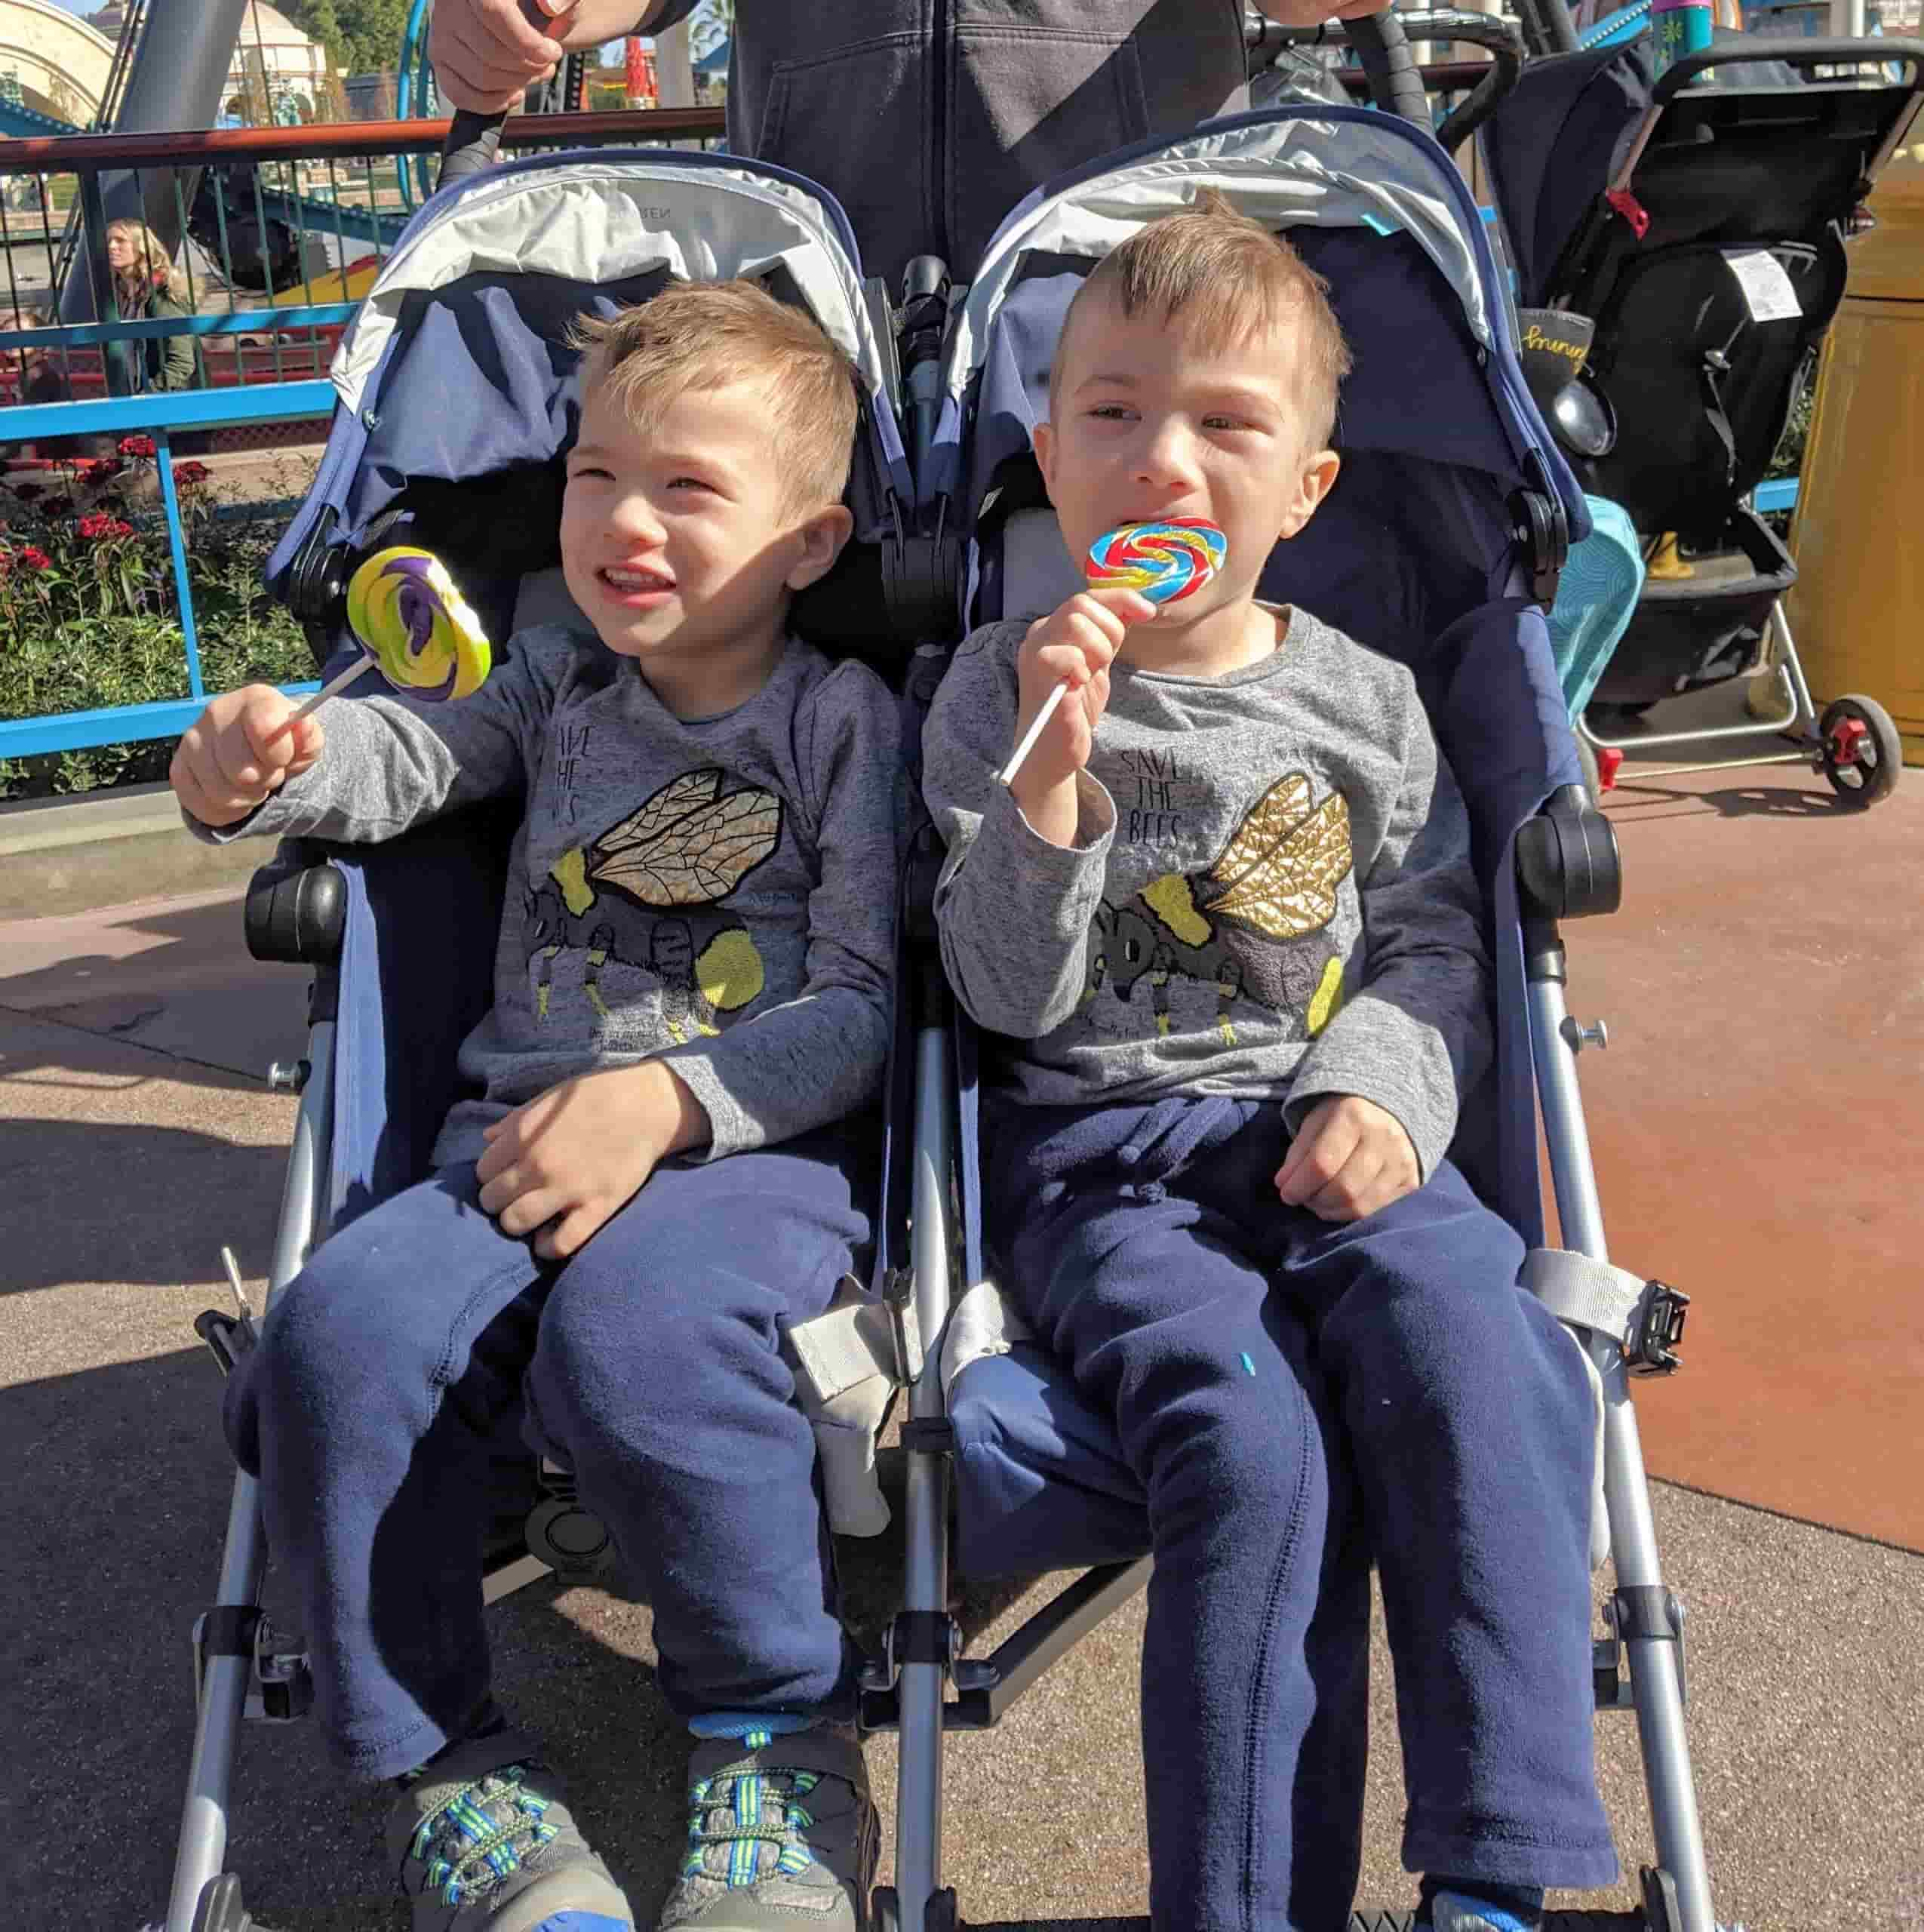 Strollers for Big Kids